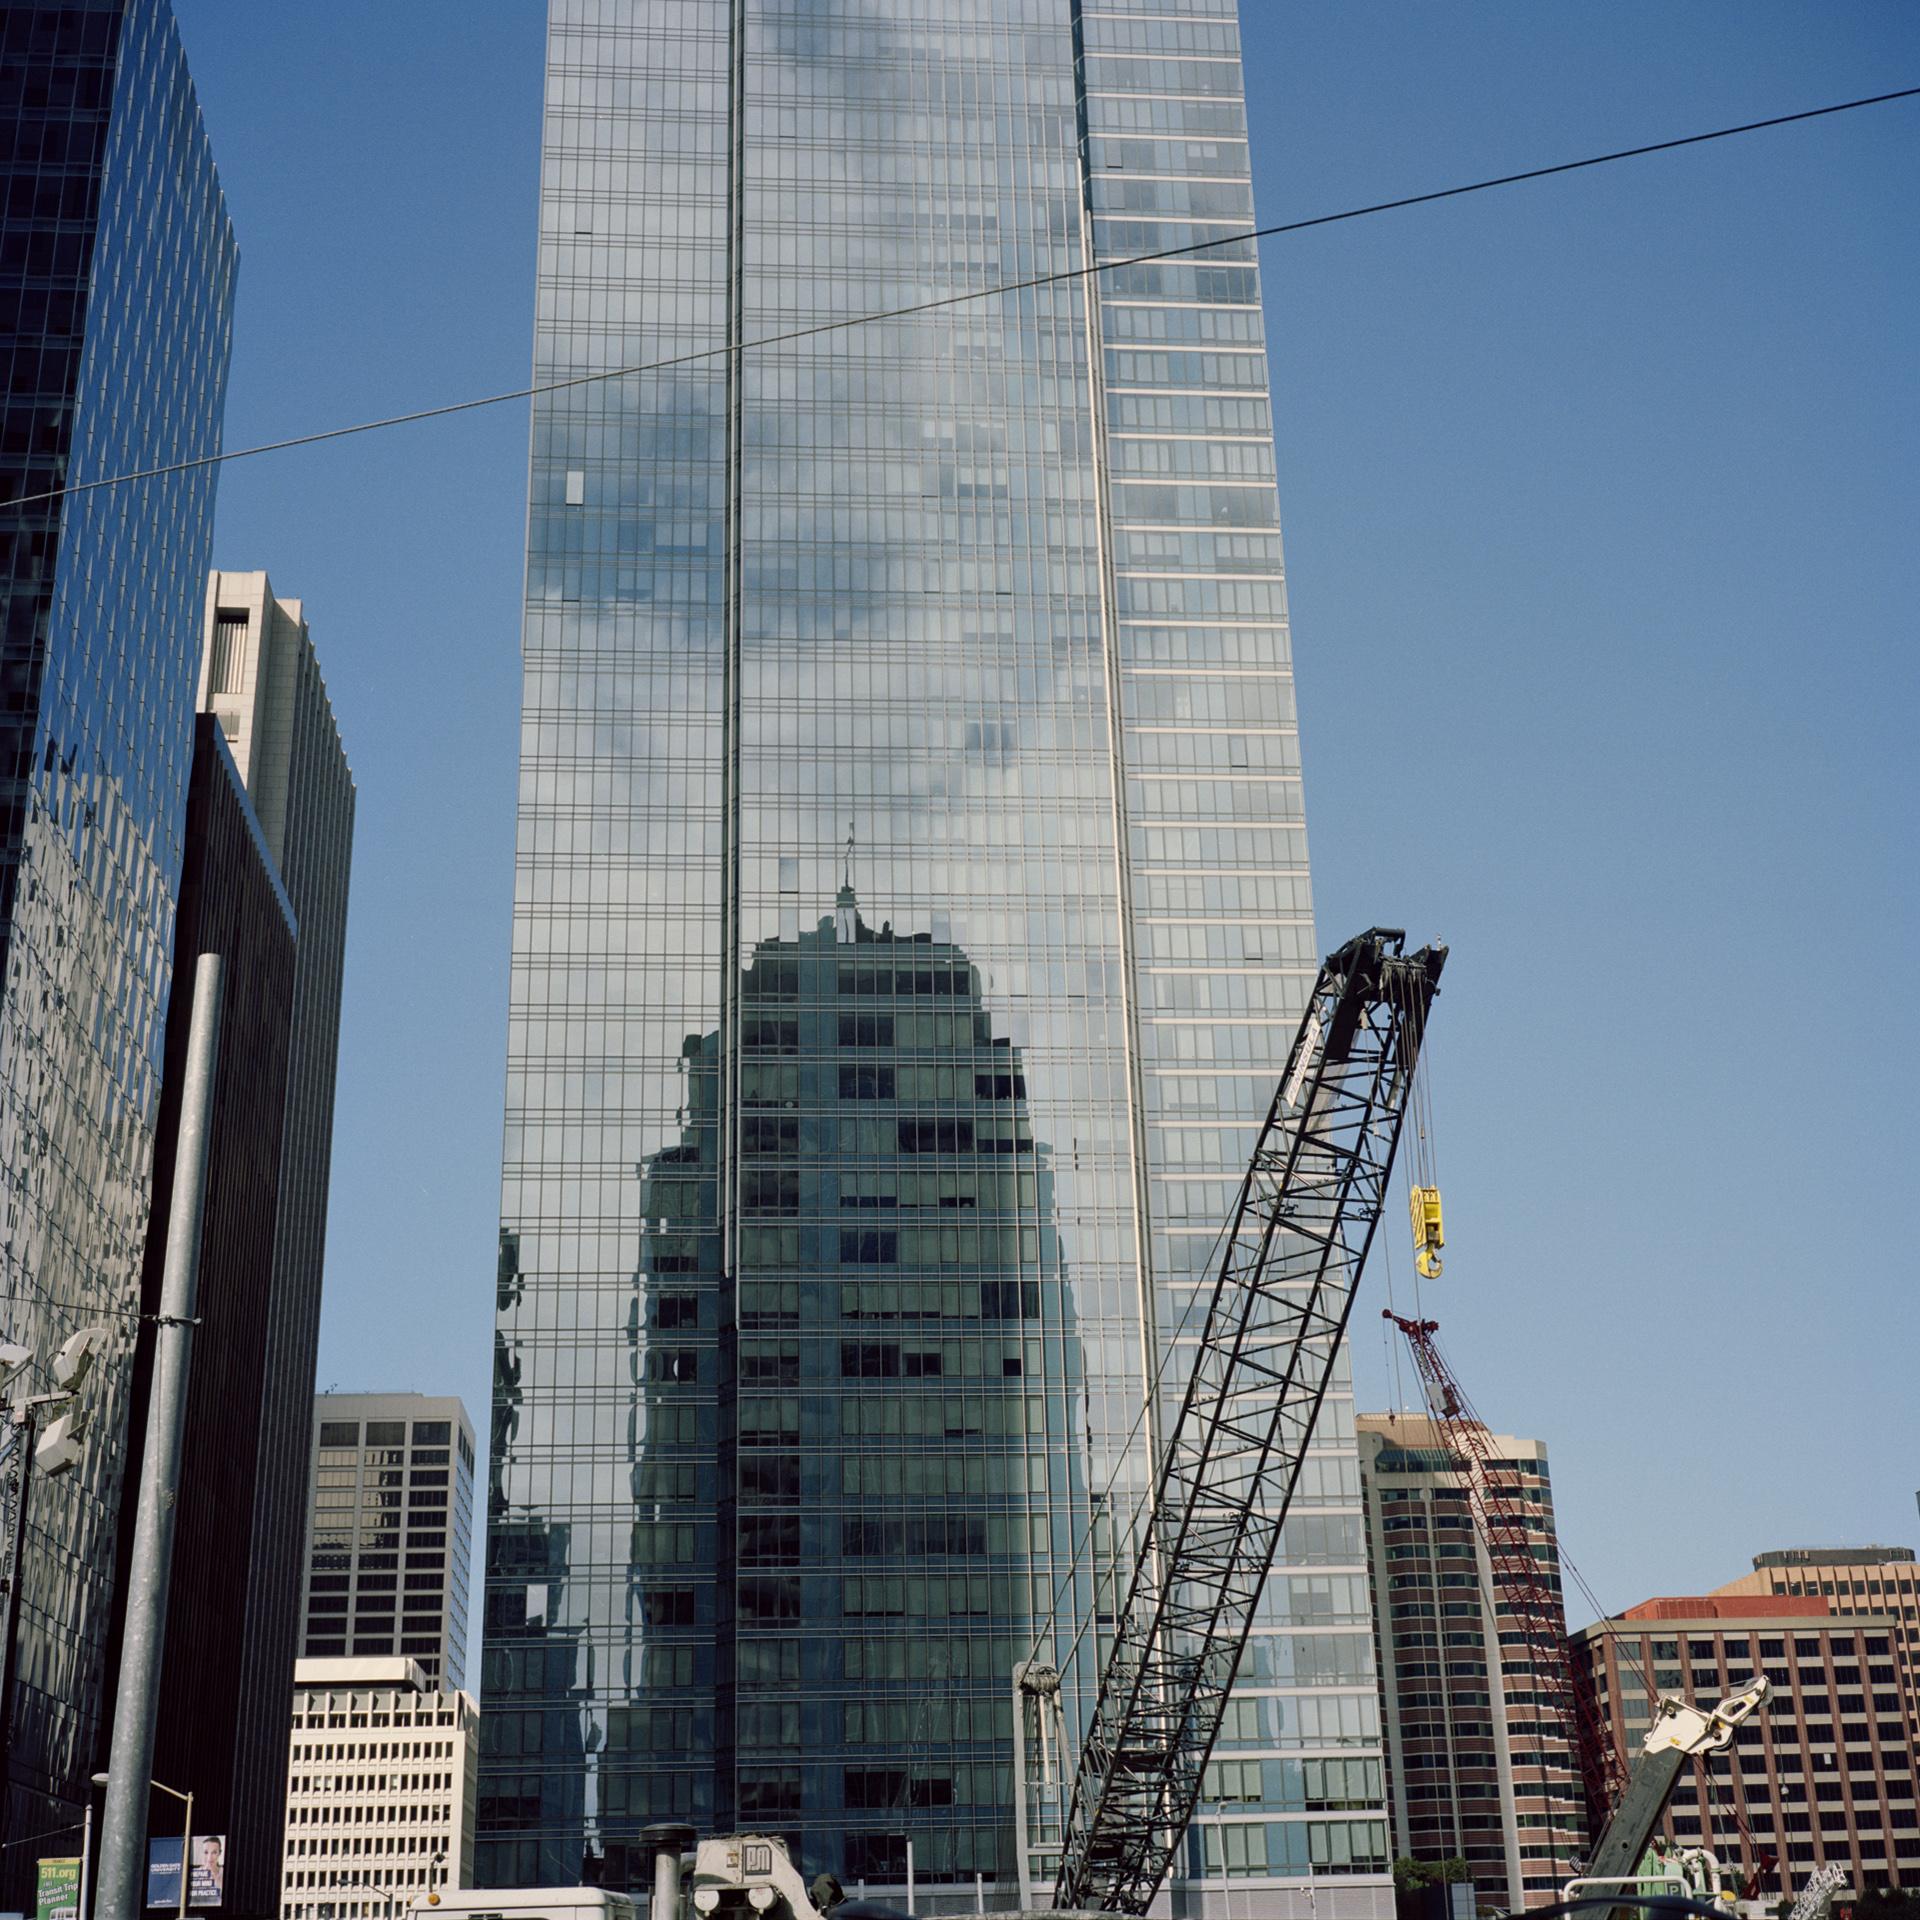 San Francisco. Construction boom.